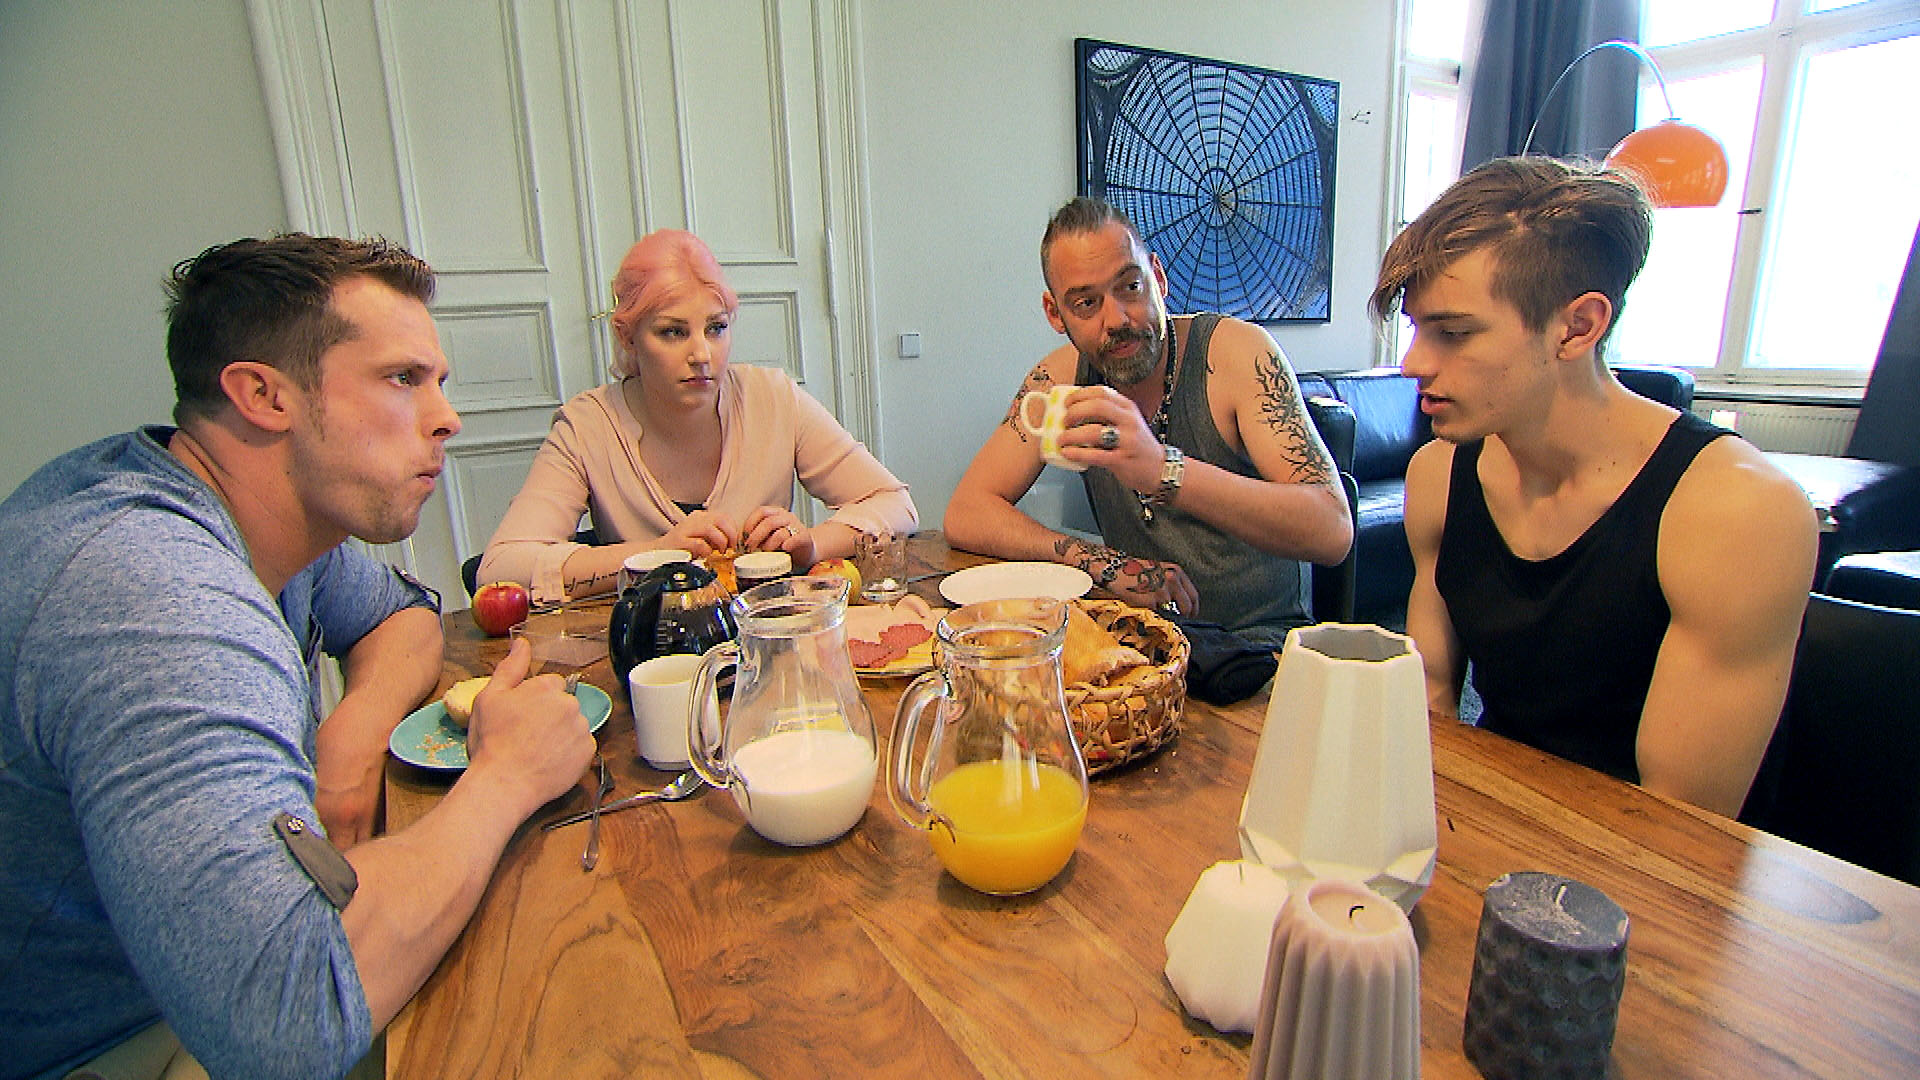 v.l.n.r.: Basti, Paula, Theo, Malte (Quelle: RTL 2)